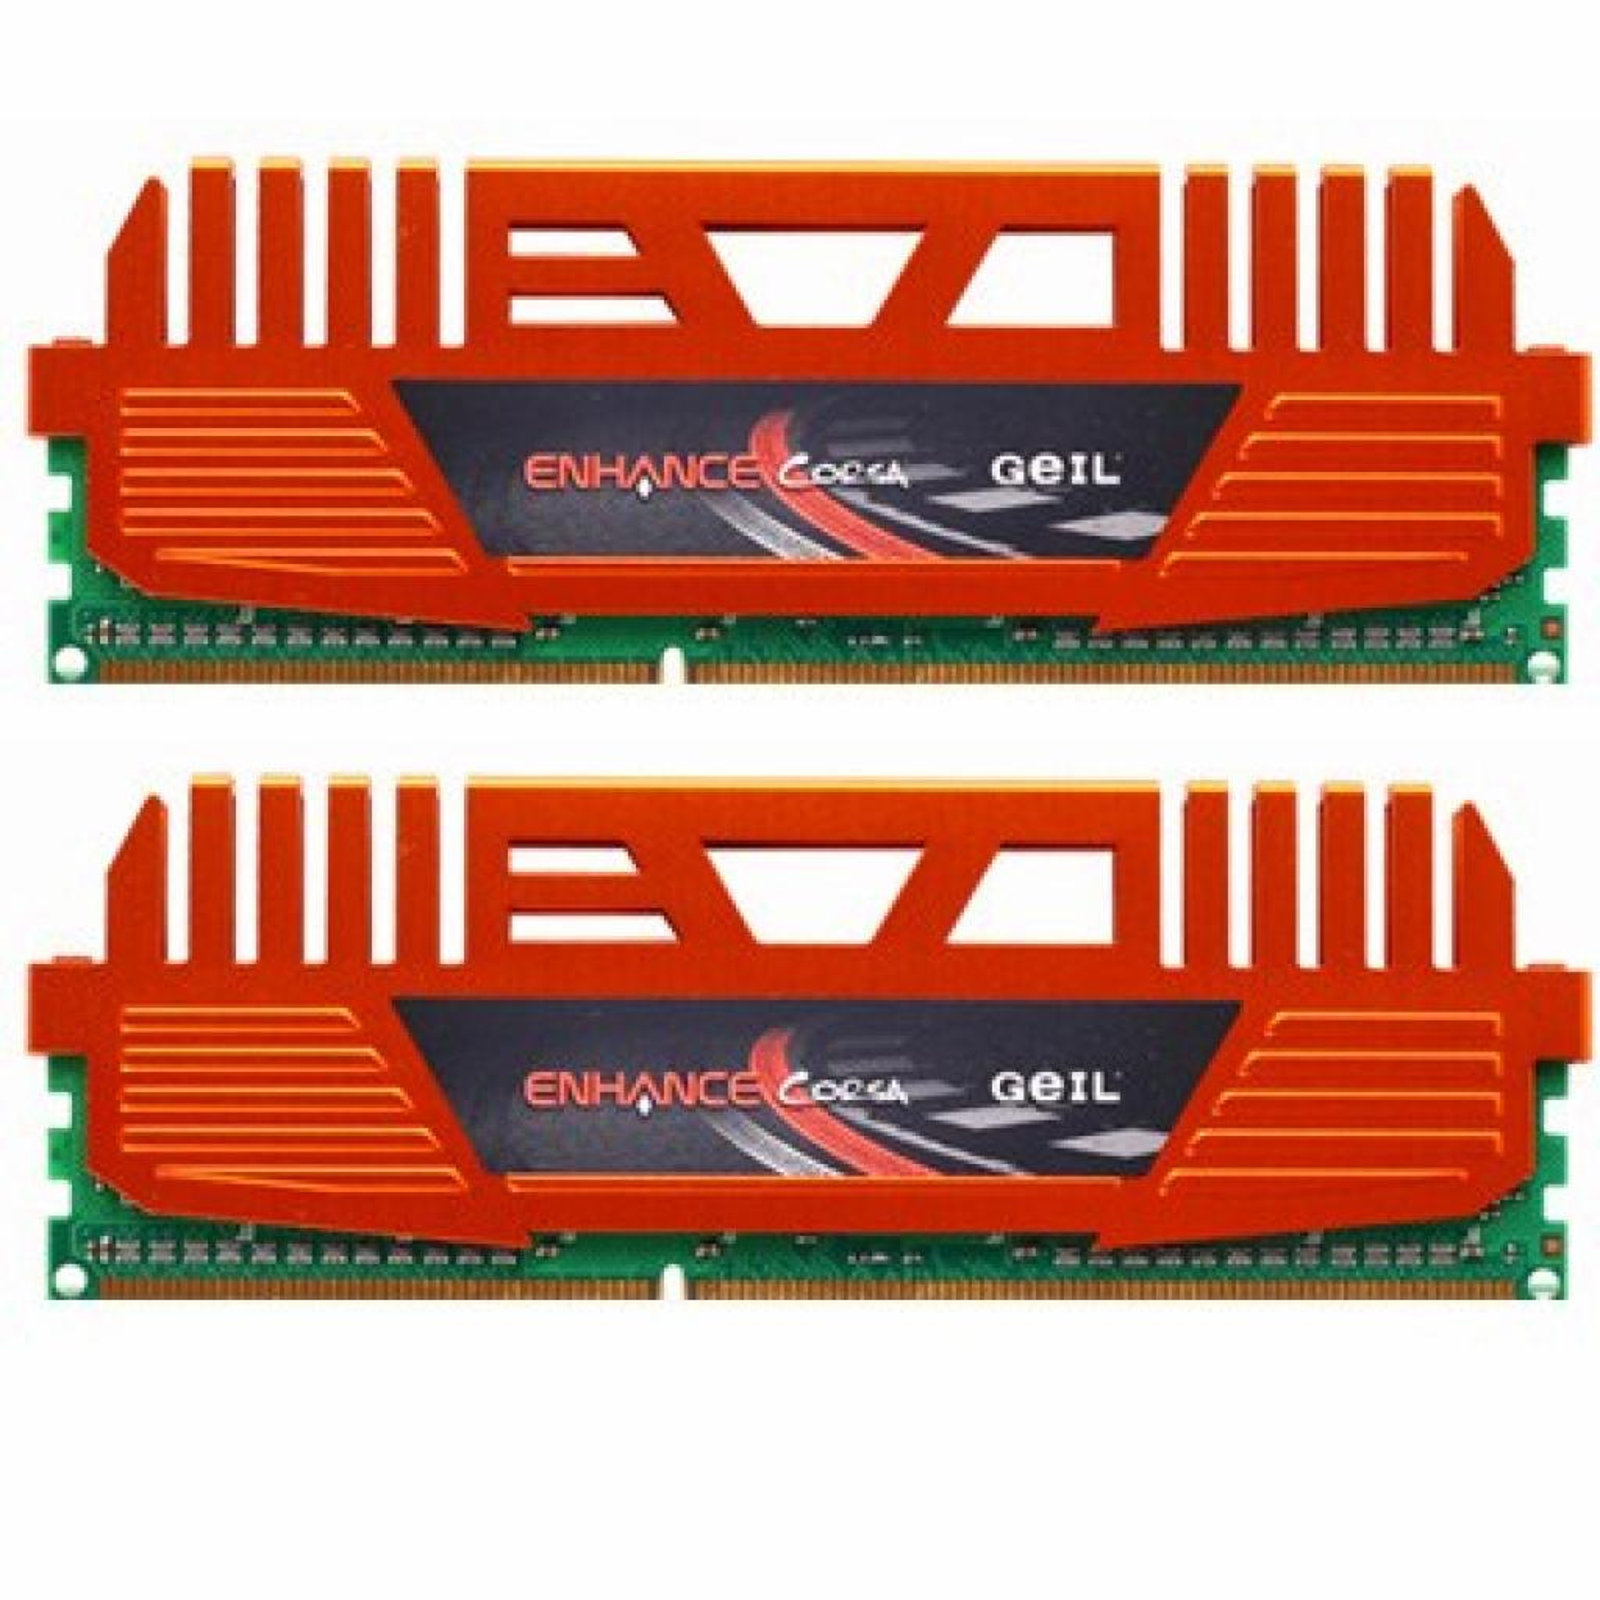 Модуль памяти для компьютера DDR3 8GB (2x4GB) 1333 MHz GEIL (GEC38GB1333C9DC)